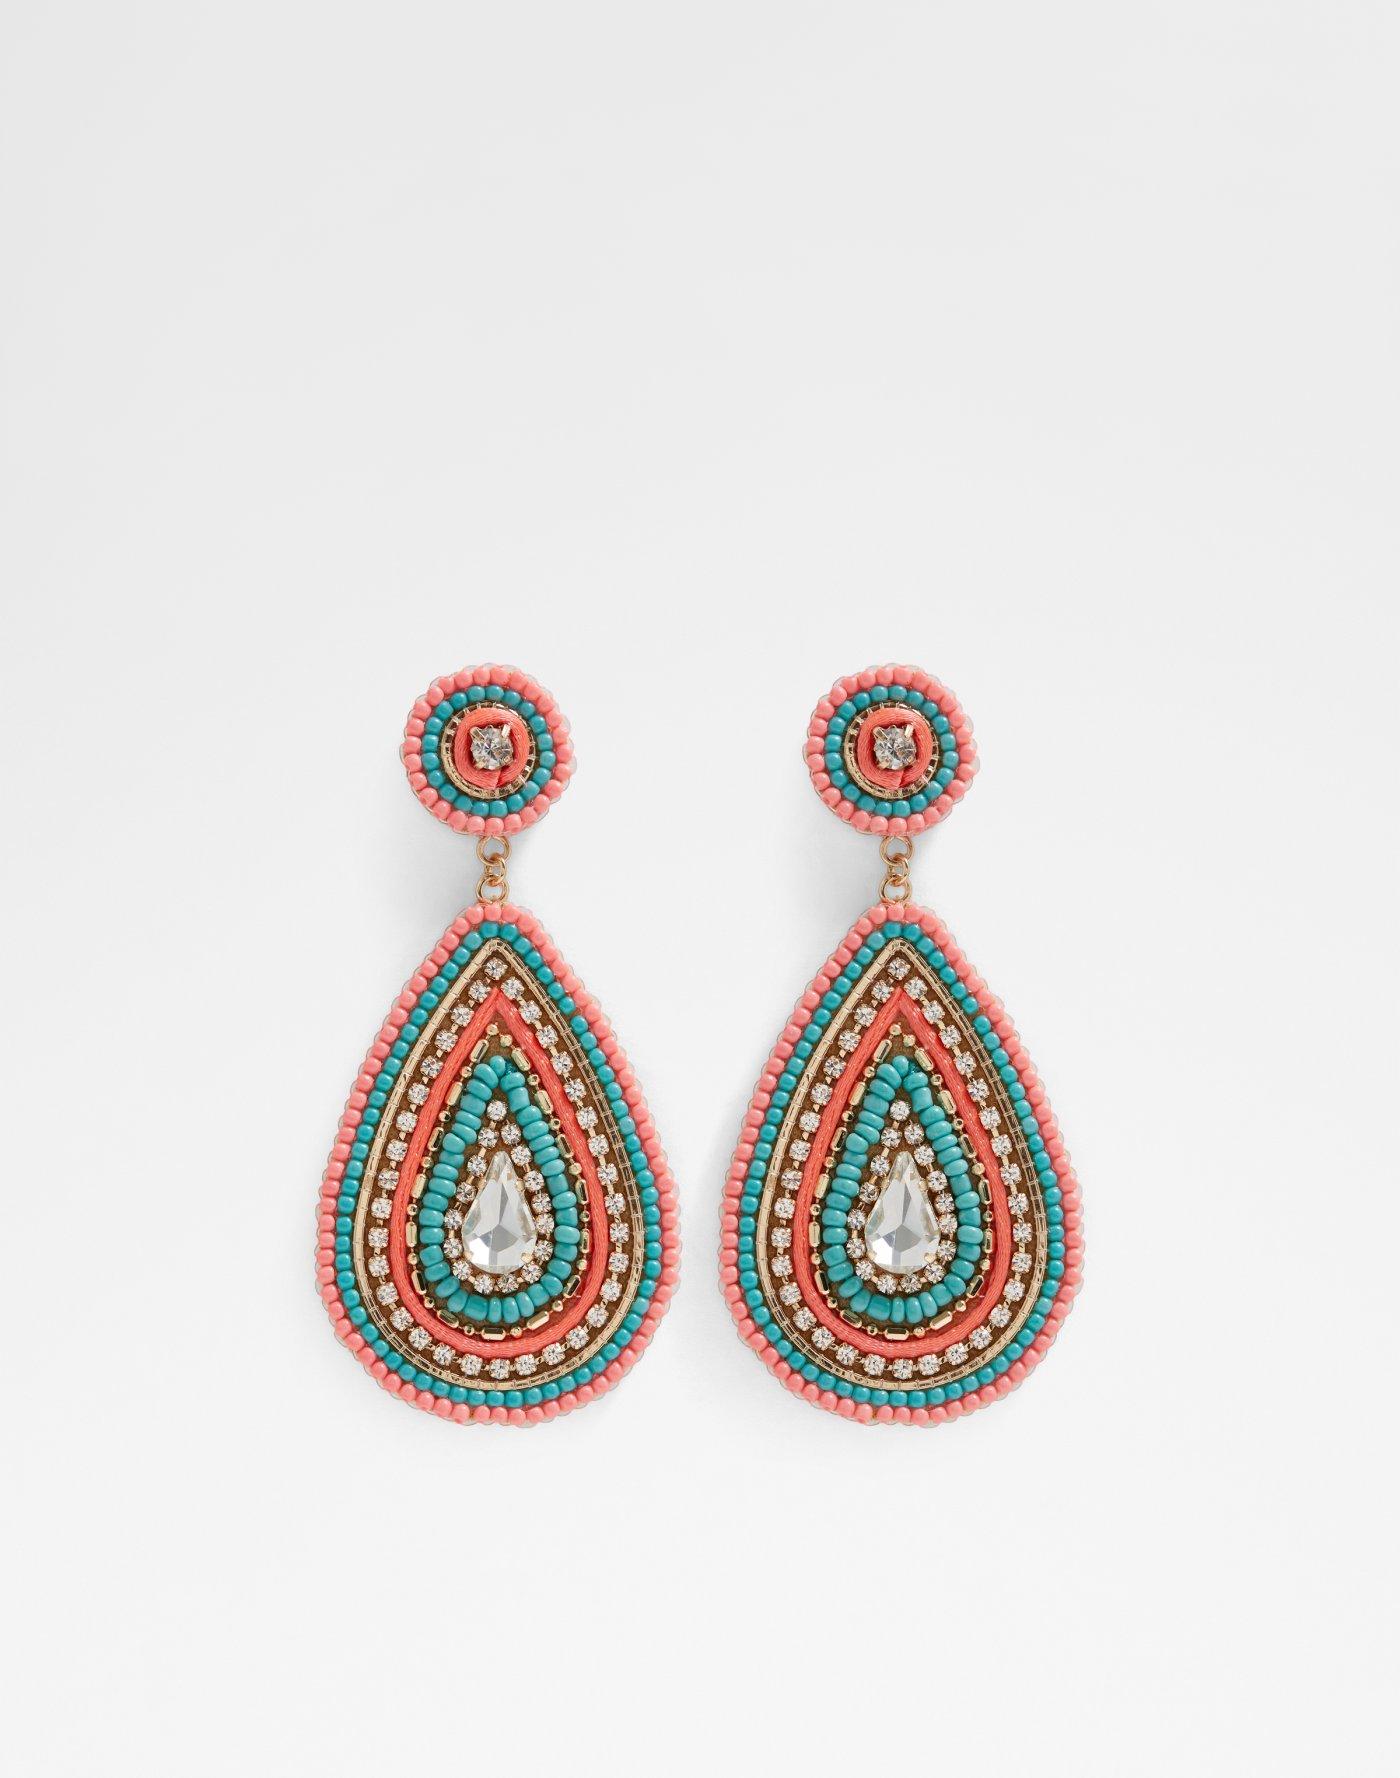 fc233615b93 Jewelry | Aldoshoes.com US